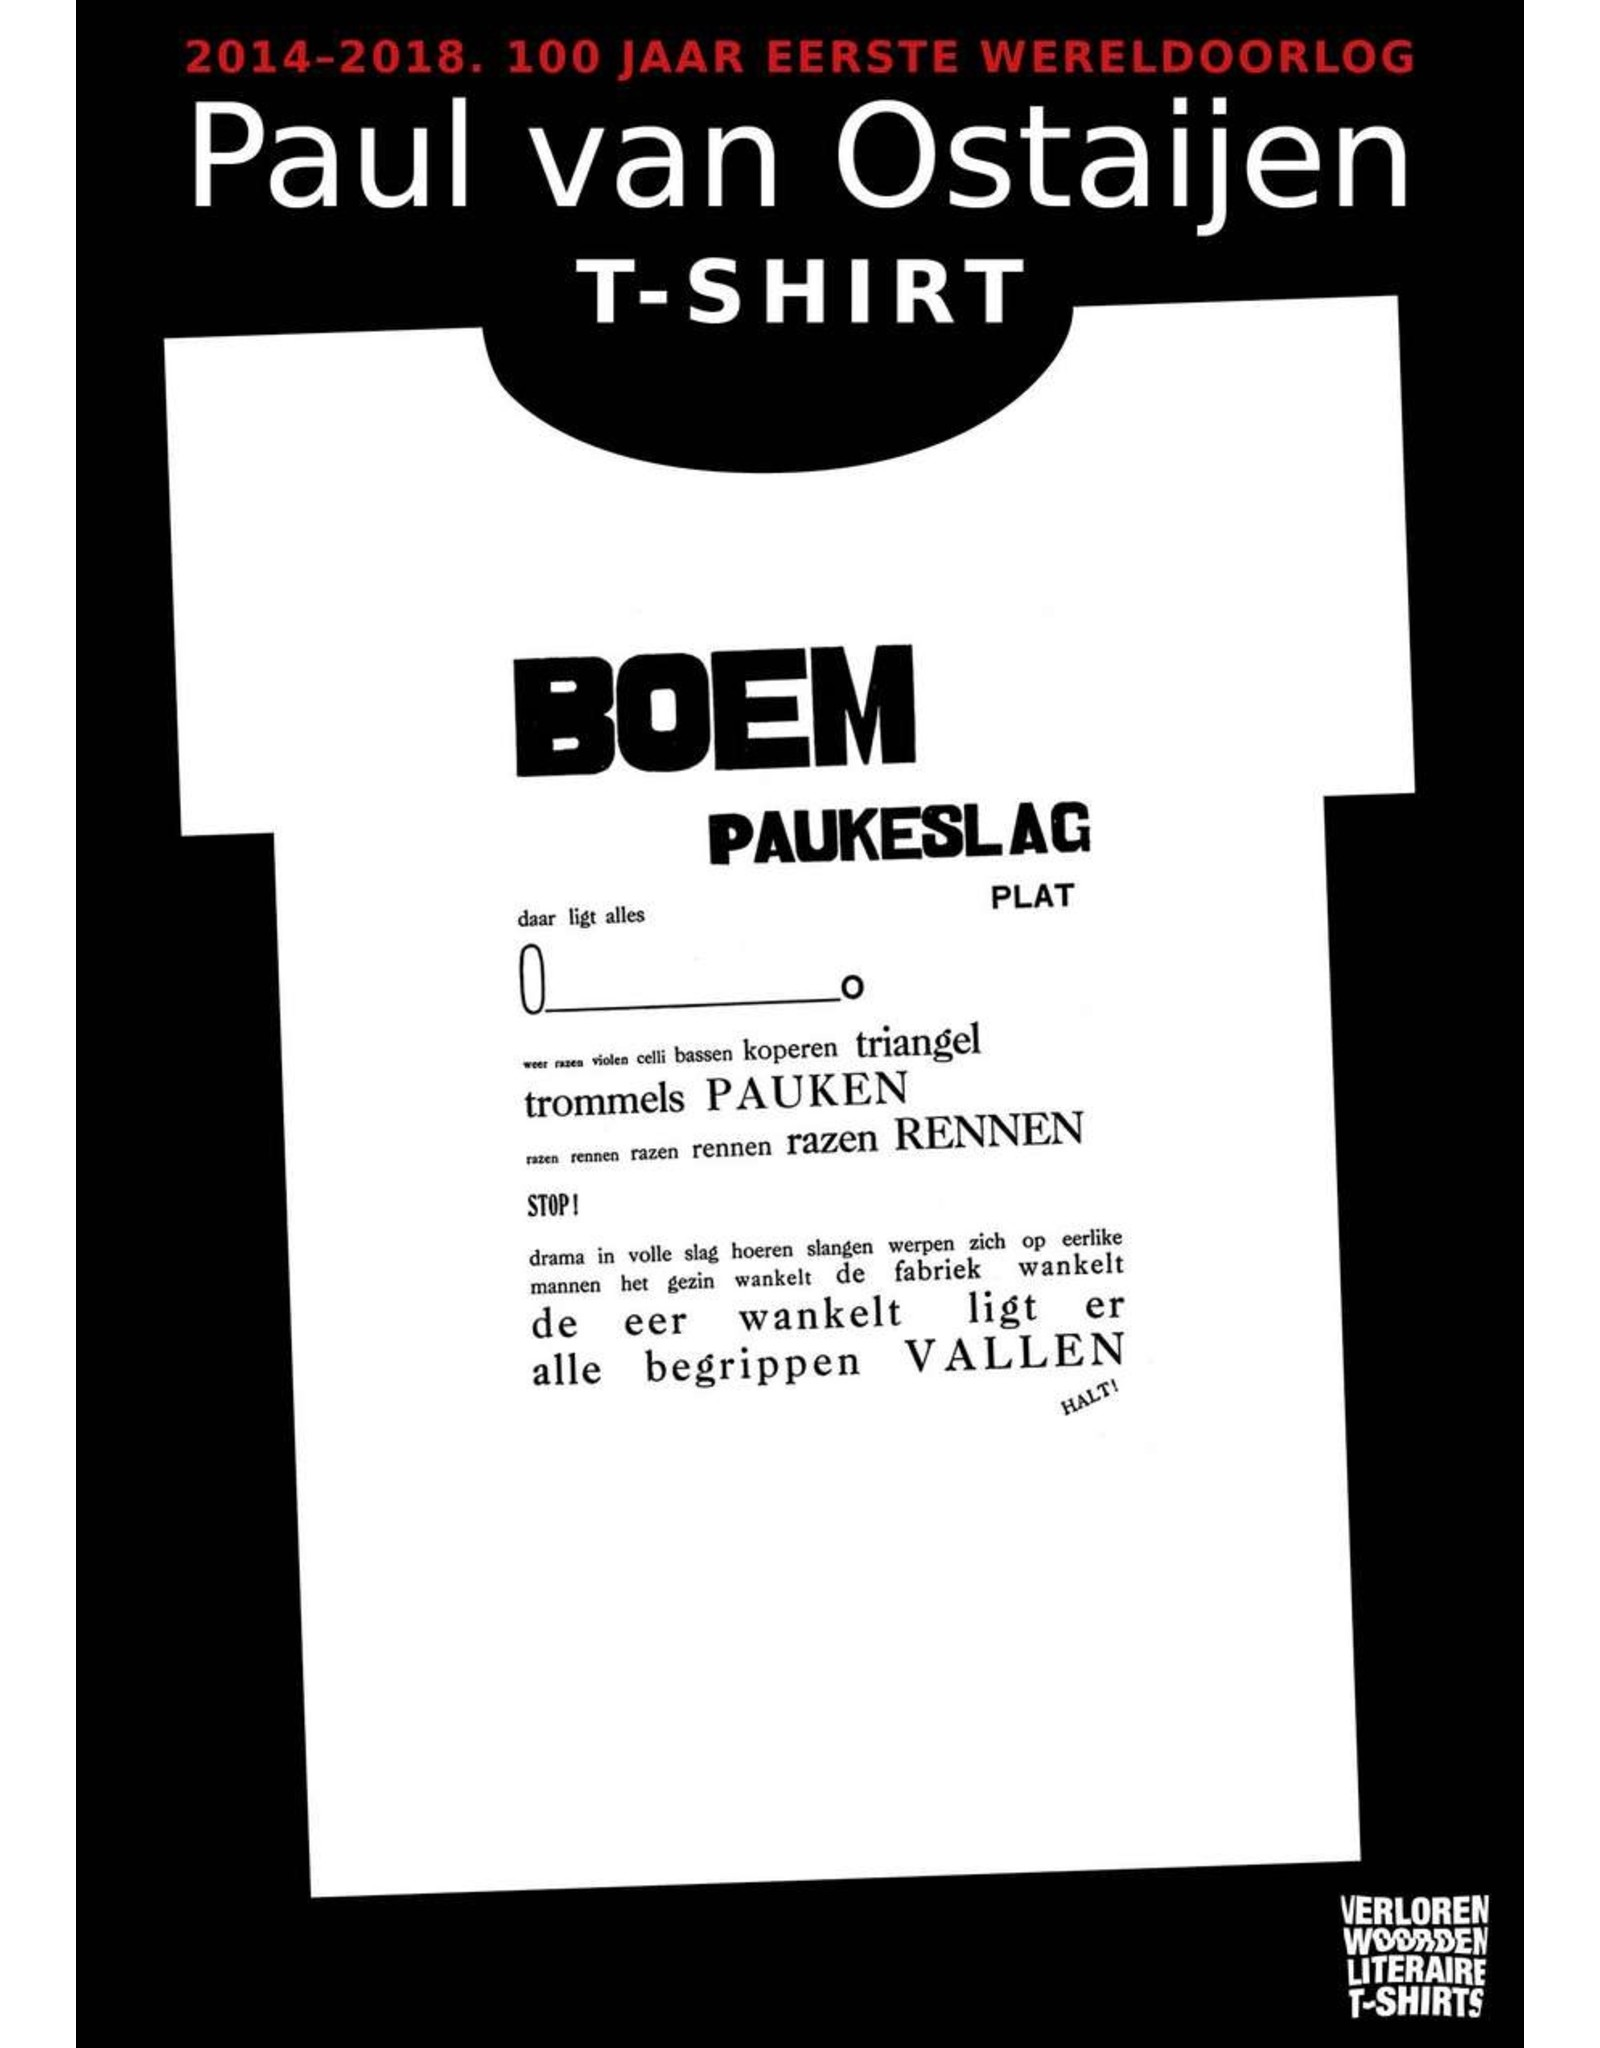 Paul van Ostaijen BOEM Paukeslag ♂ (black)